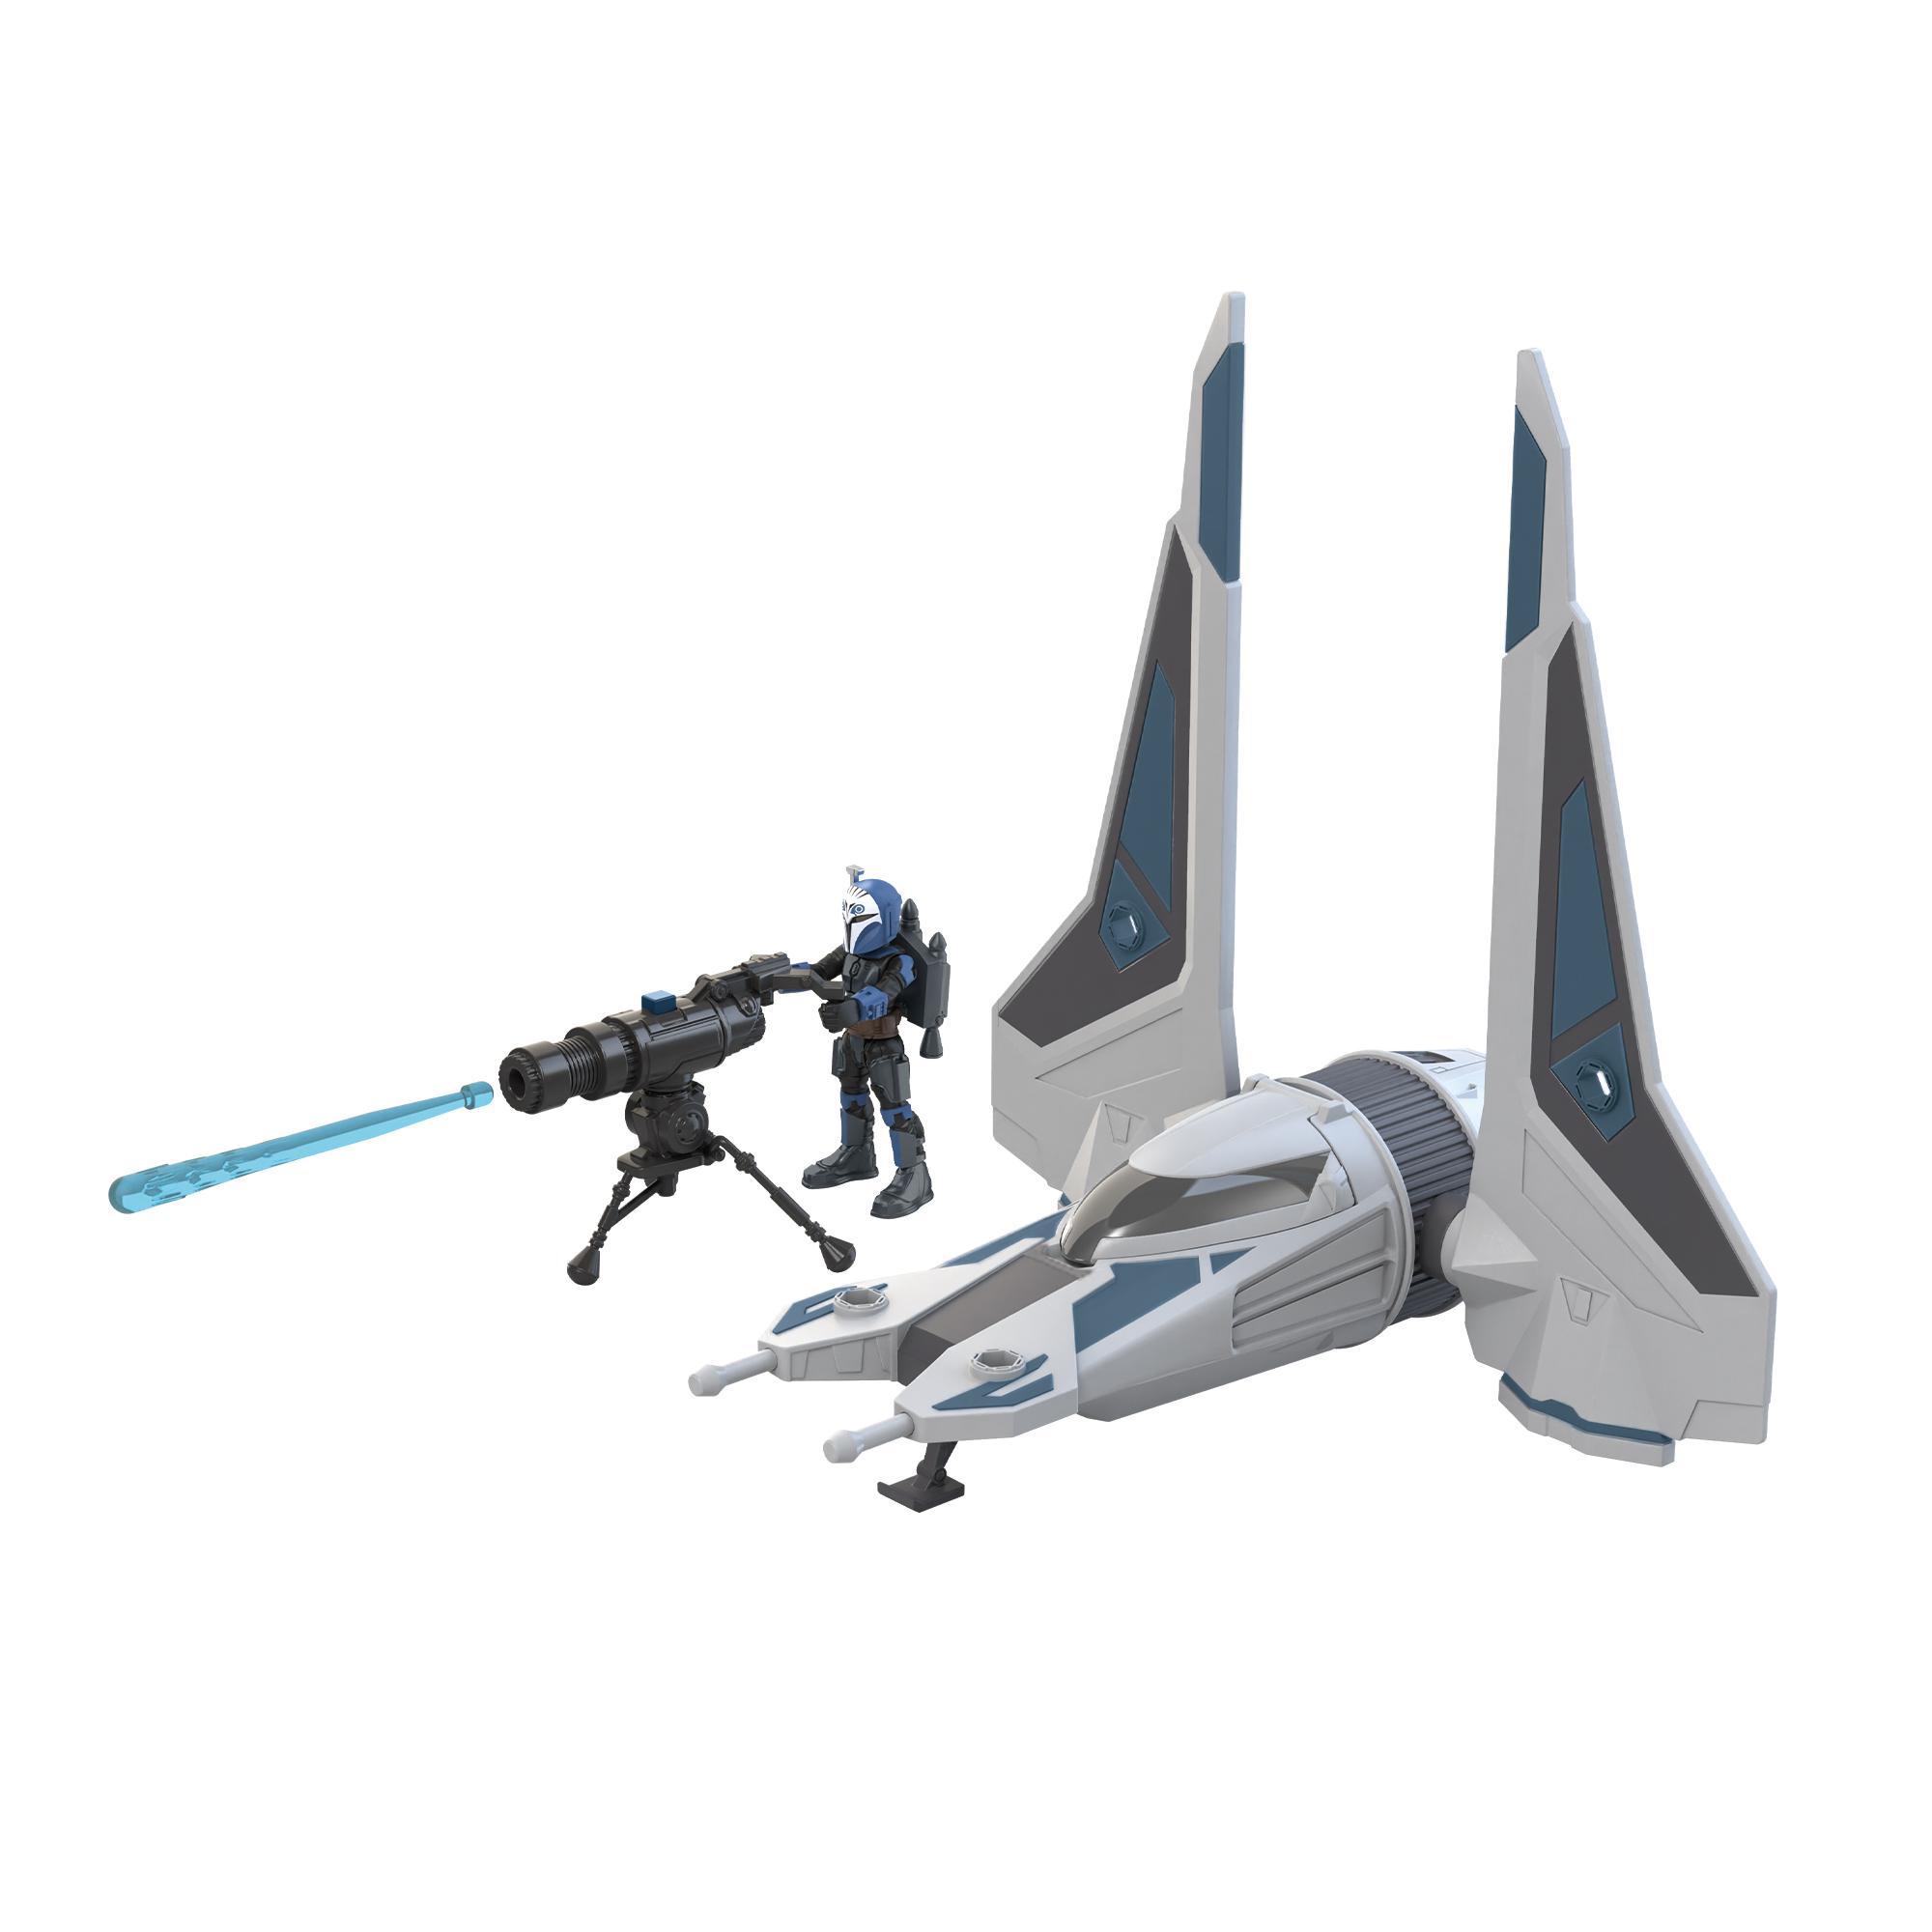 Star Wars Mission Fleet Bo-Katan Gauntlet Starfighter